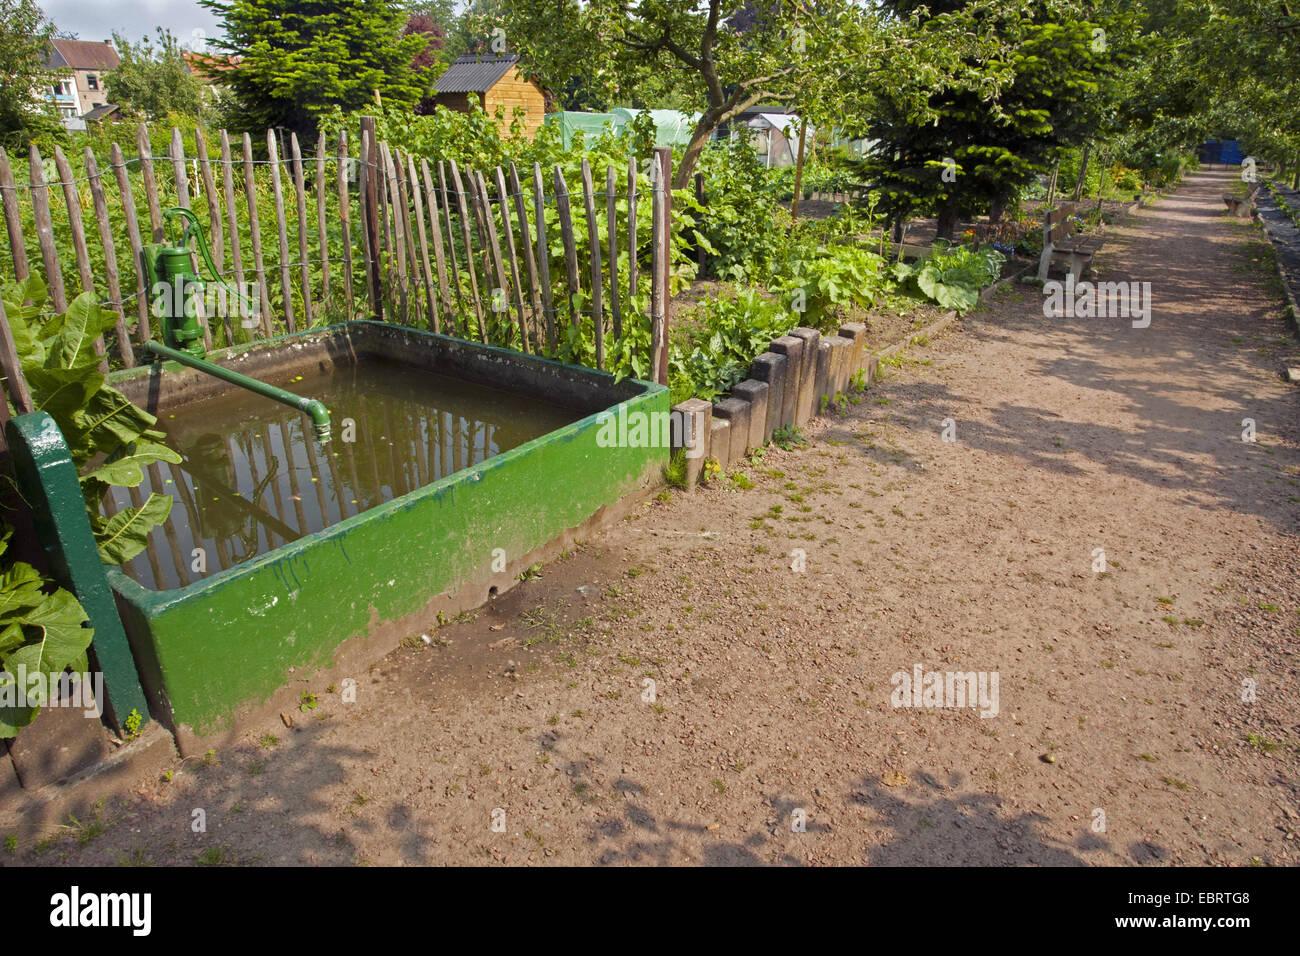 Water Tap In A Garden Stock Photos & Water Tap In A Garden Stock ...